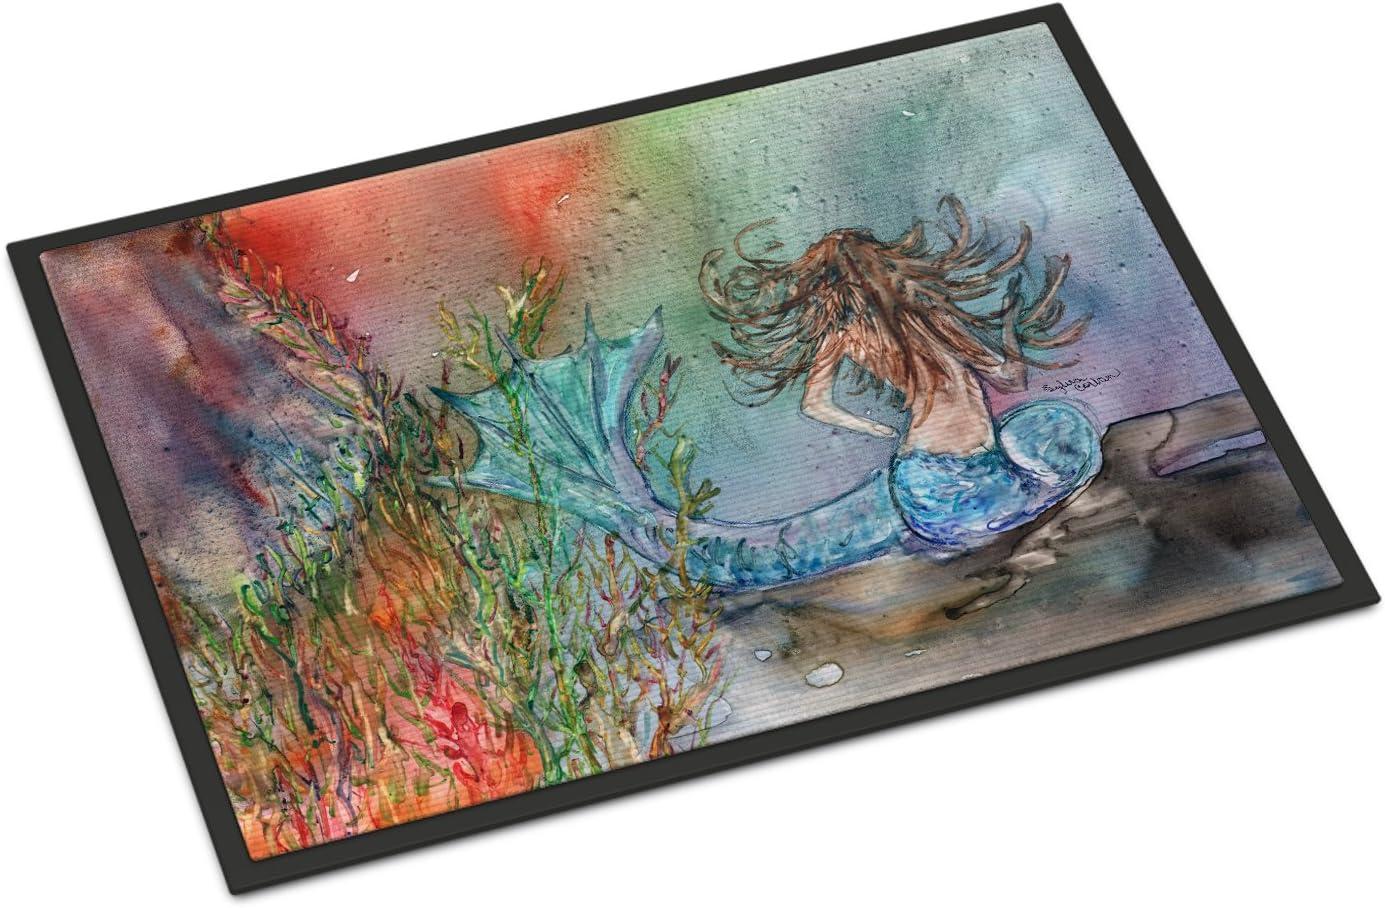 Caroline s Treasures DND0133MAT Waterlilies by Neil Drury Indoor or Outdoor Mat 18×27, 18H X 27W, Multicolor